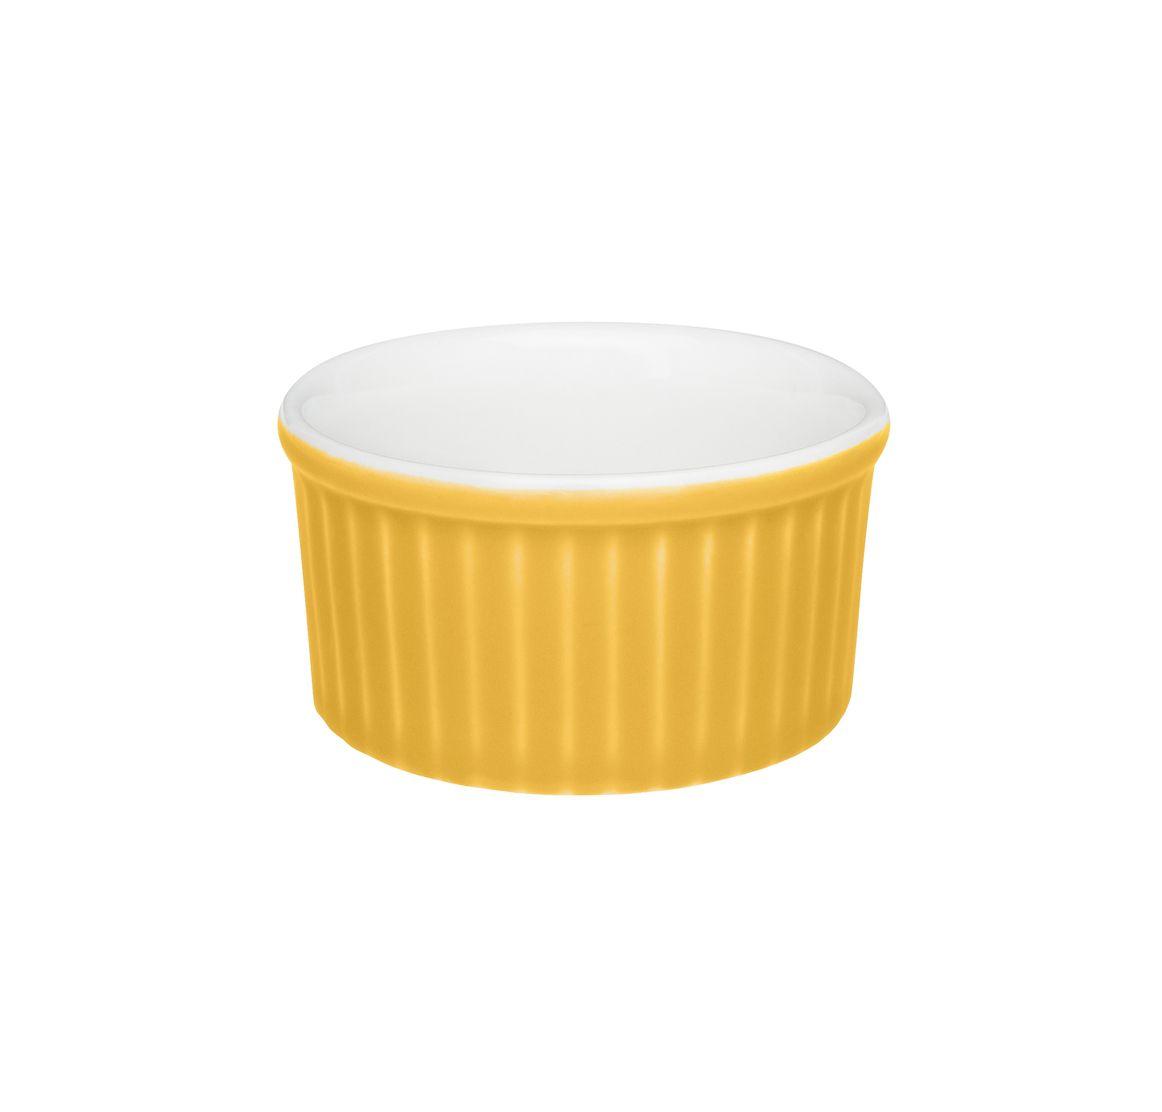 Tigela Ramequin 8X4Cm 100Ml - Branco/Amarelo - Oxford Cookware